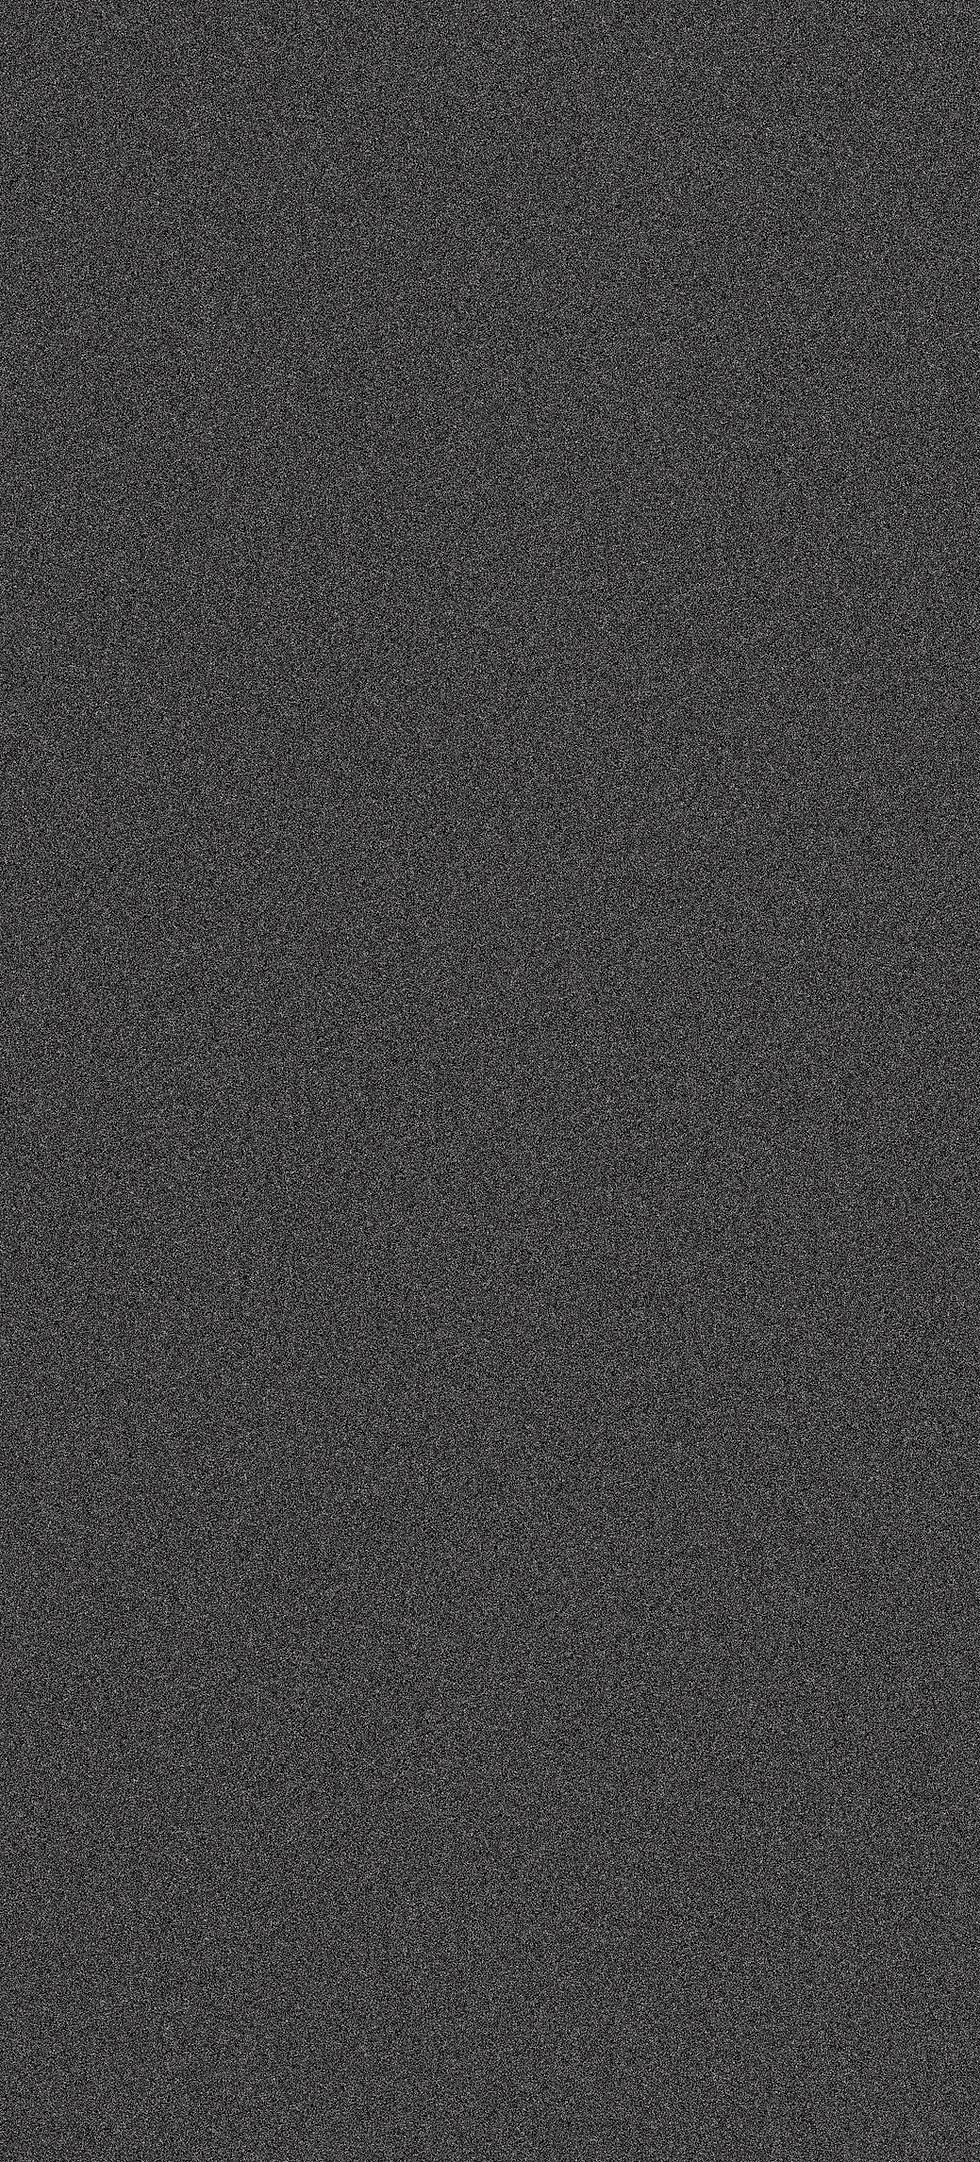 gradient-Overlay.png